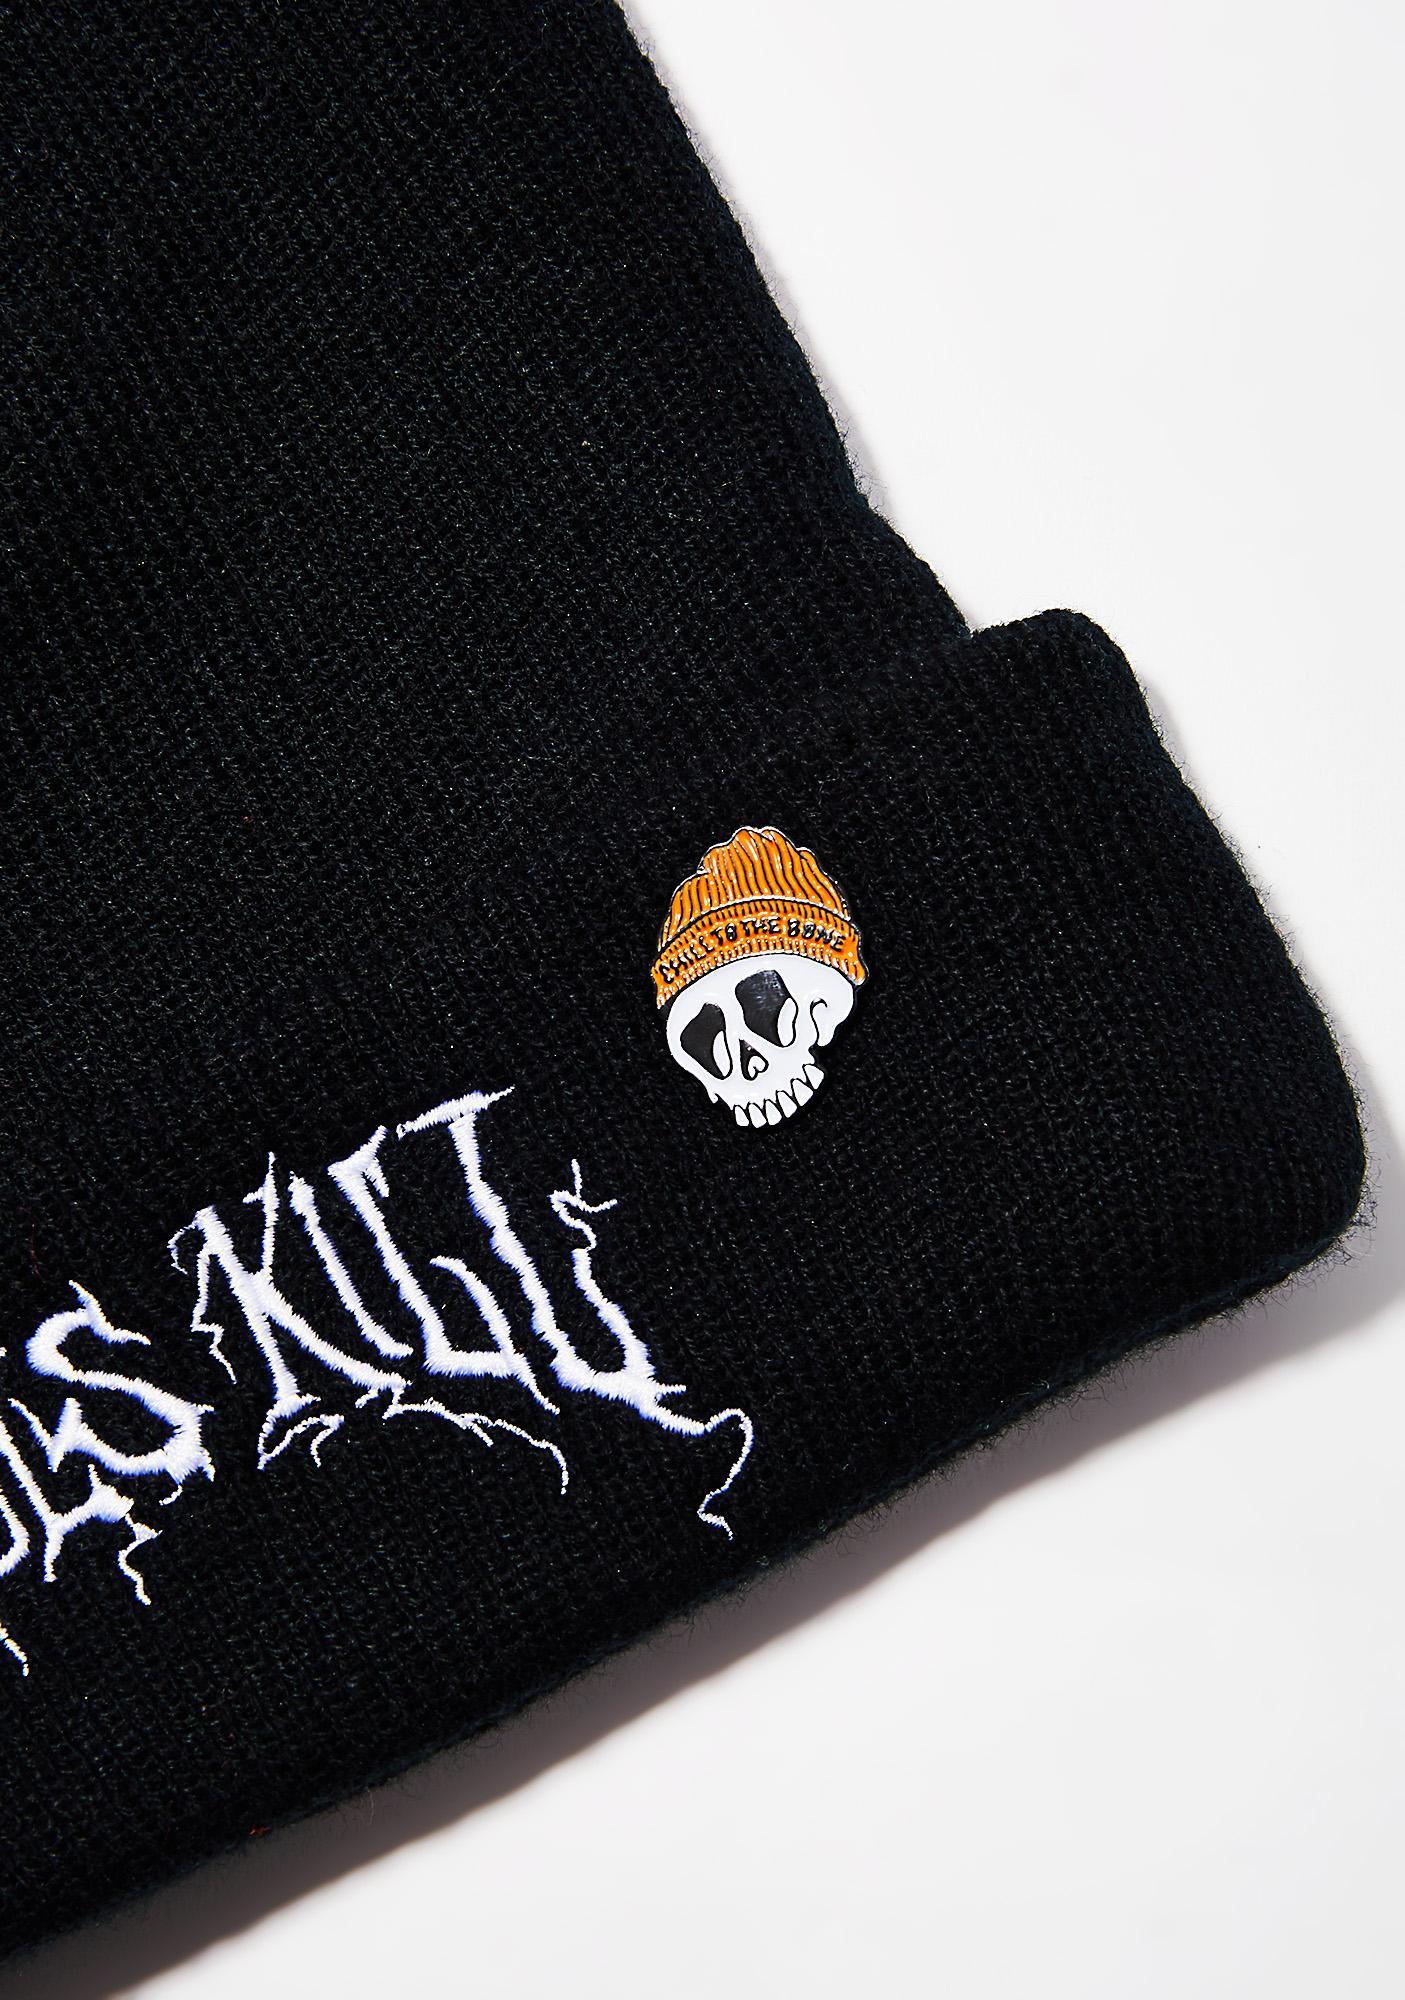 Slushcult Chill To The Bone Pin